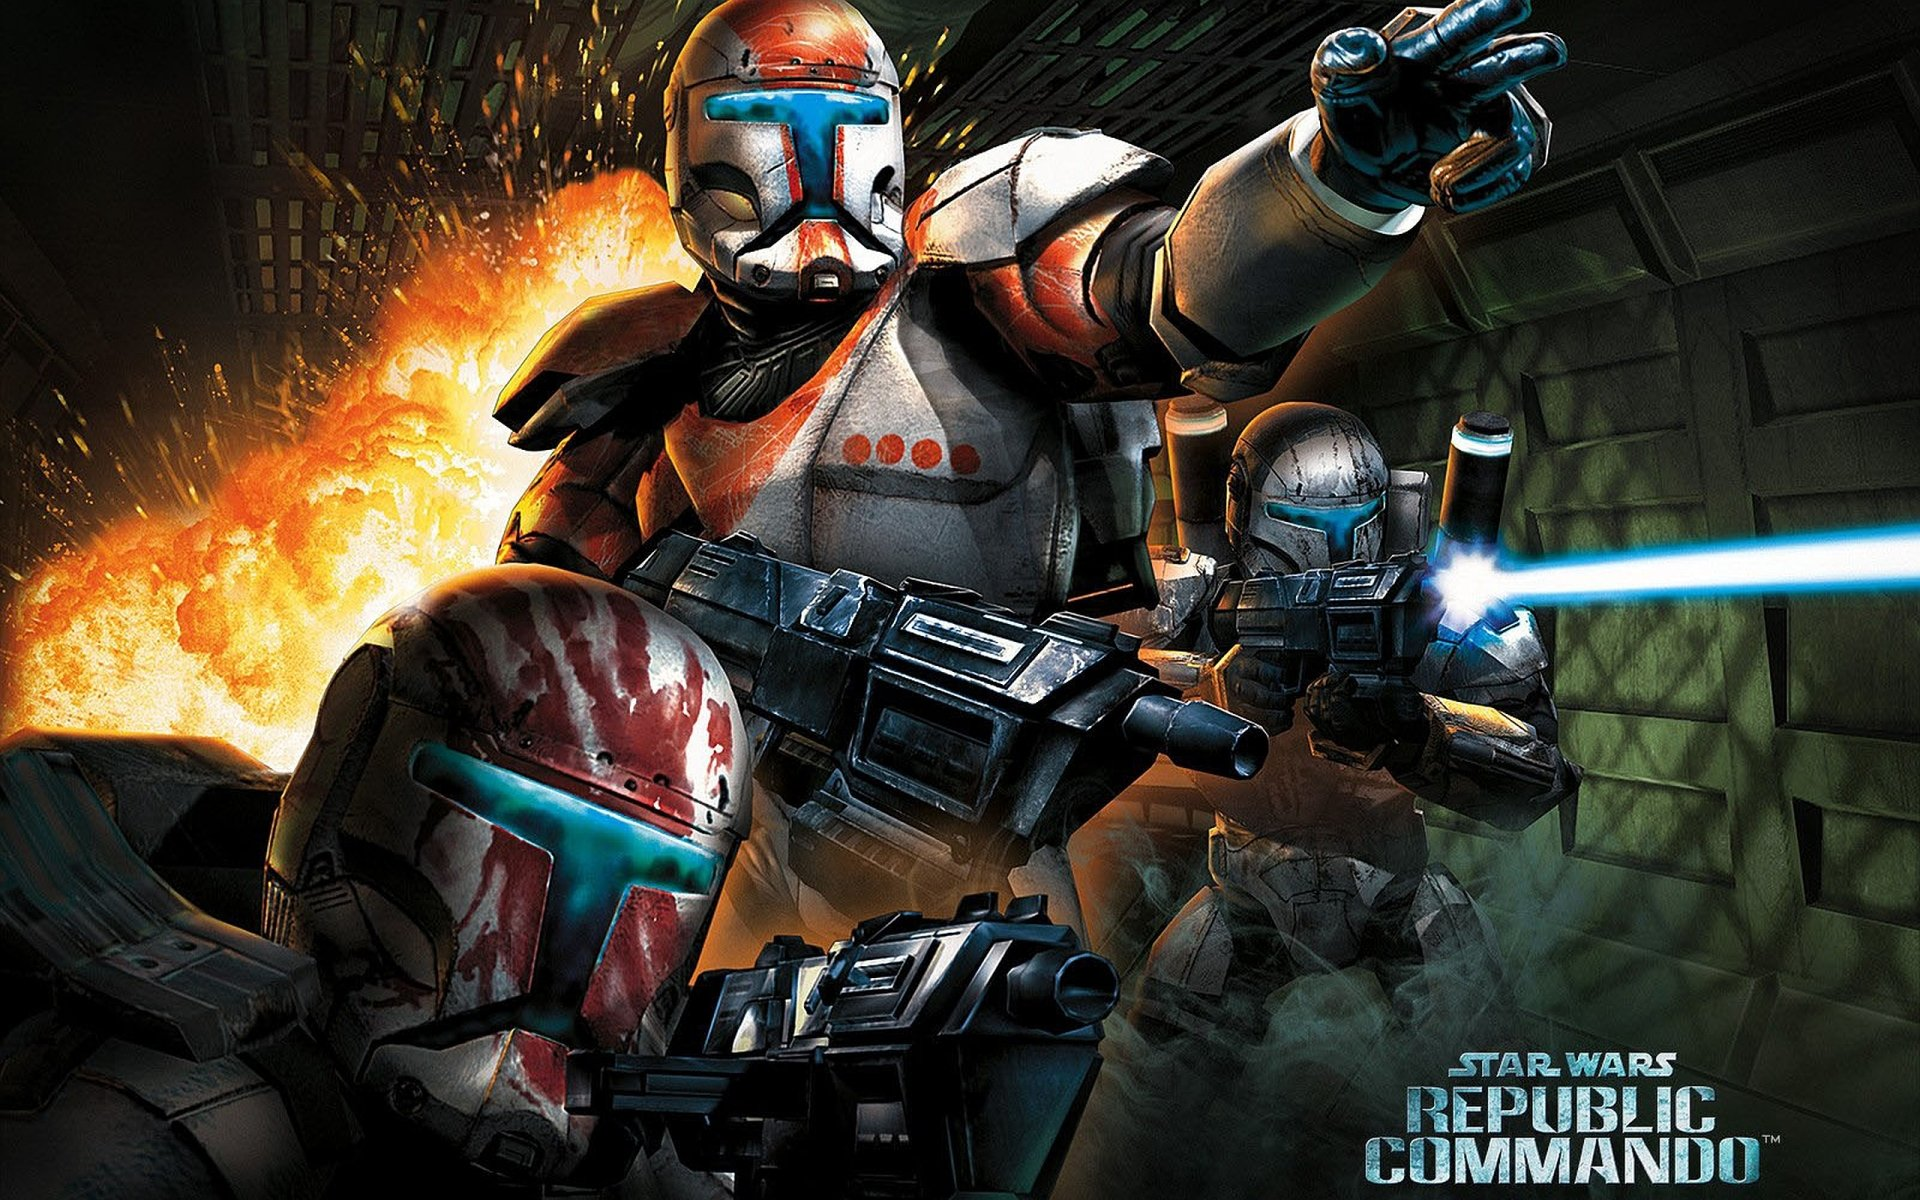 Star Wars: Republic Commando Full HD Wallpaper and ...